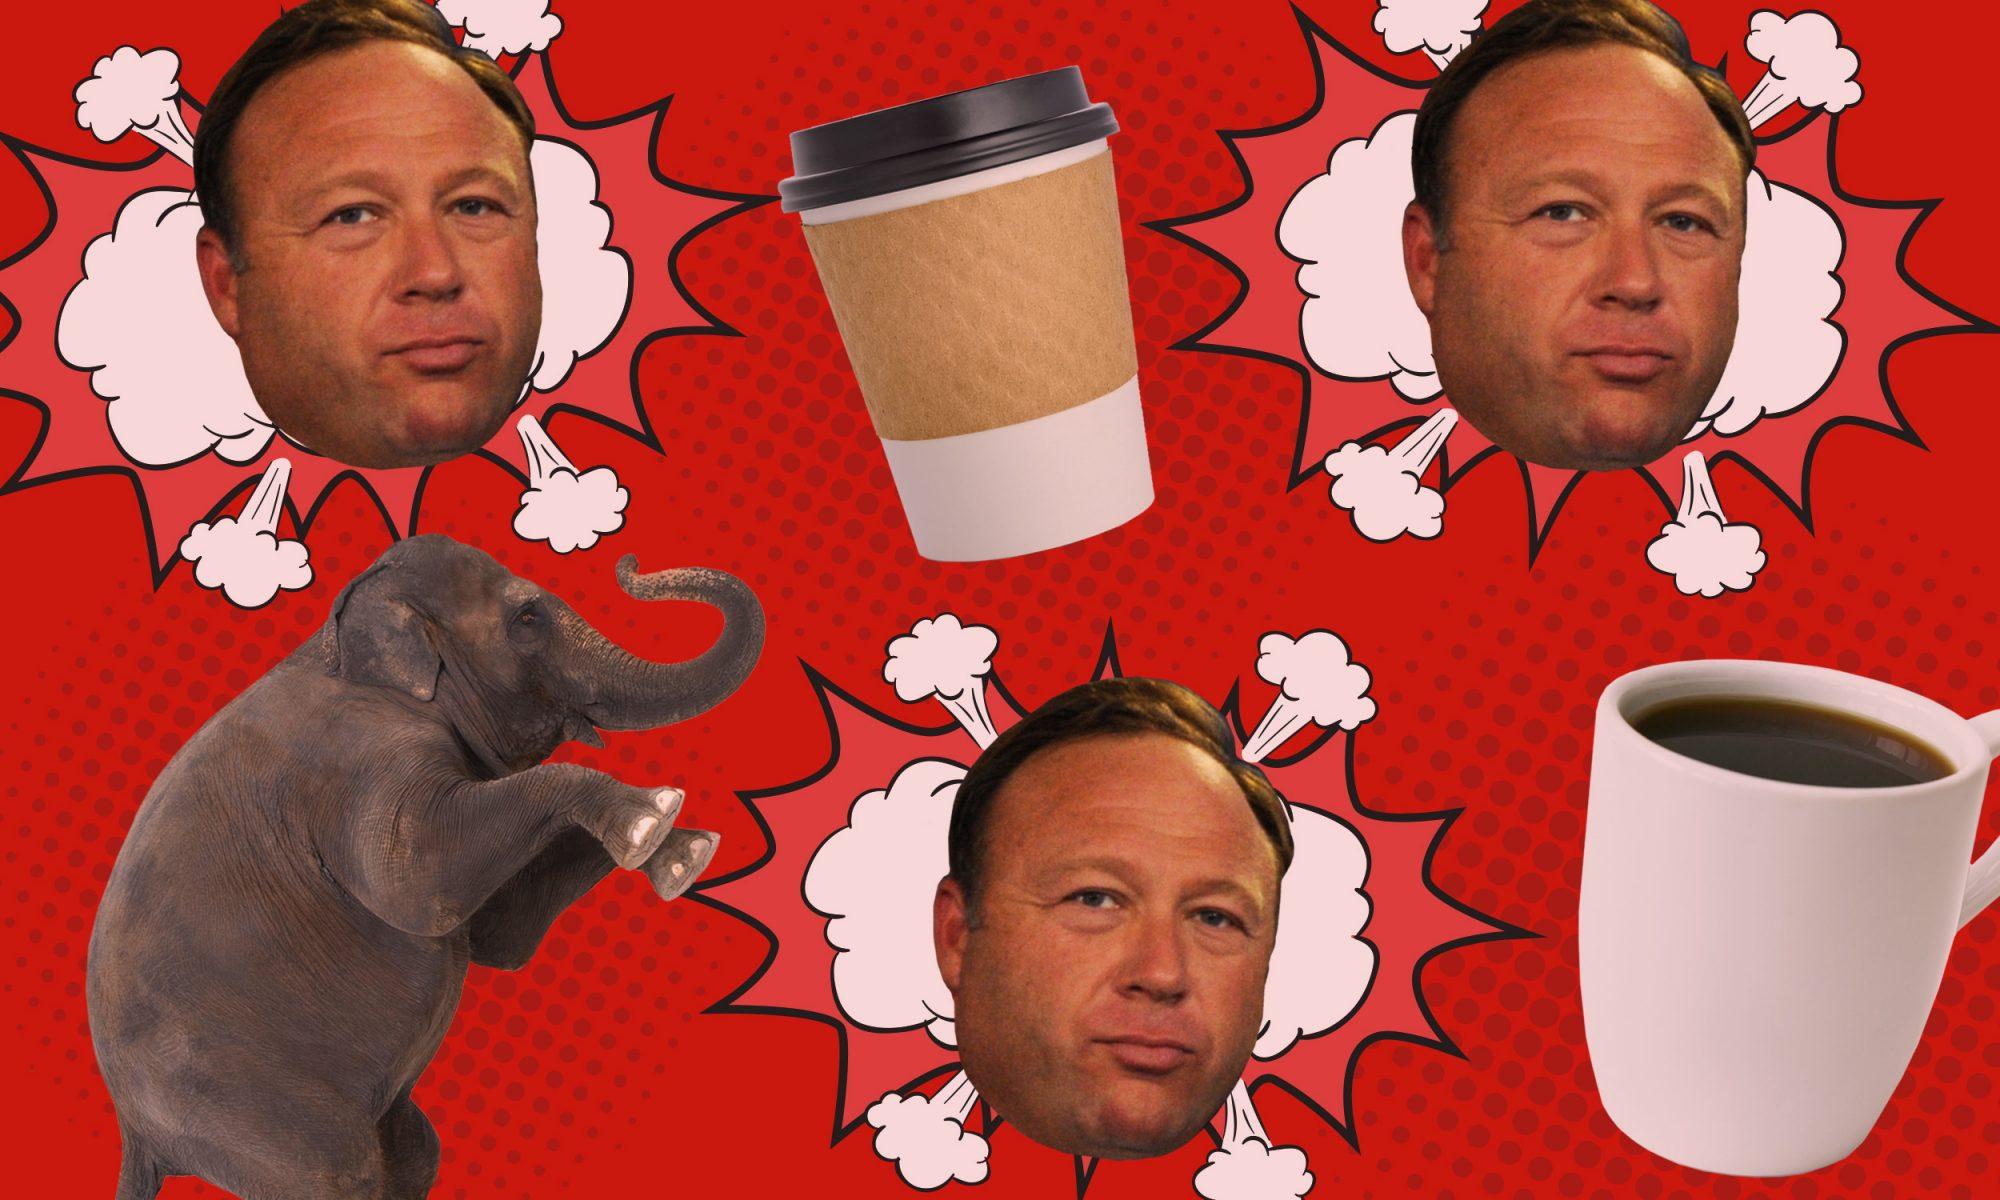 coffee and alex jones